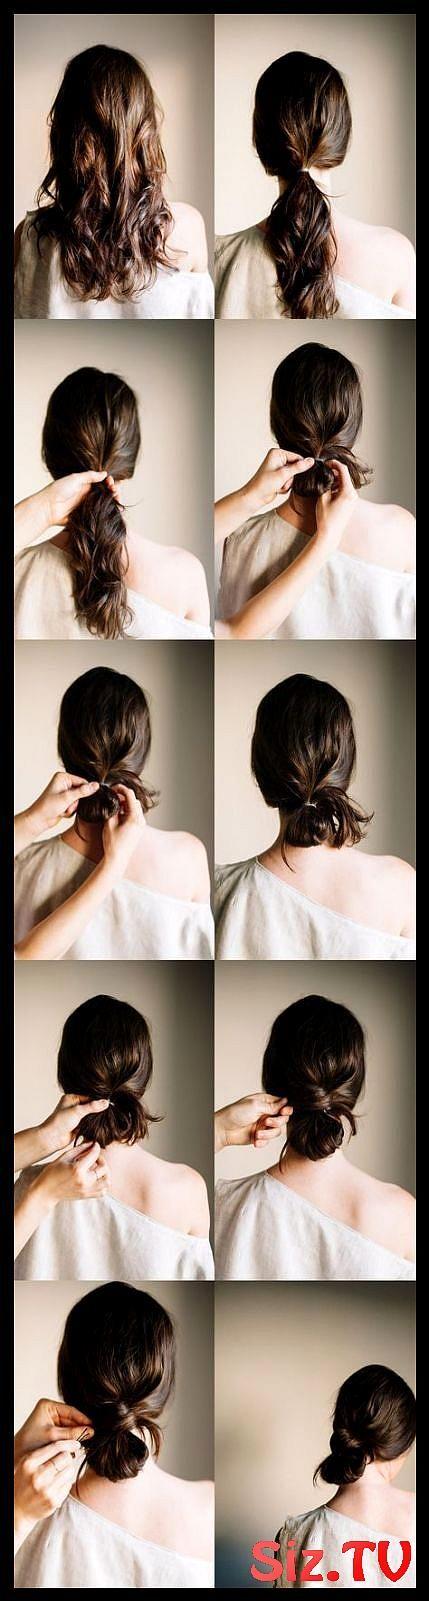 Wedding Hairstyles Simple Bun Top Knot 57 Ideas For 2019 Wedding Hairstyles Simple Bun Top Knot 57 Ideas For 2019 Wedding Hairstyles #messybuntopknotu...